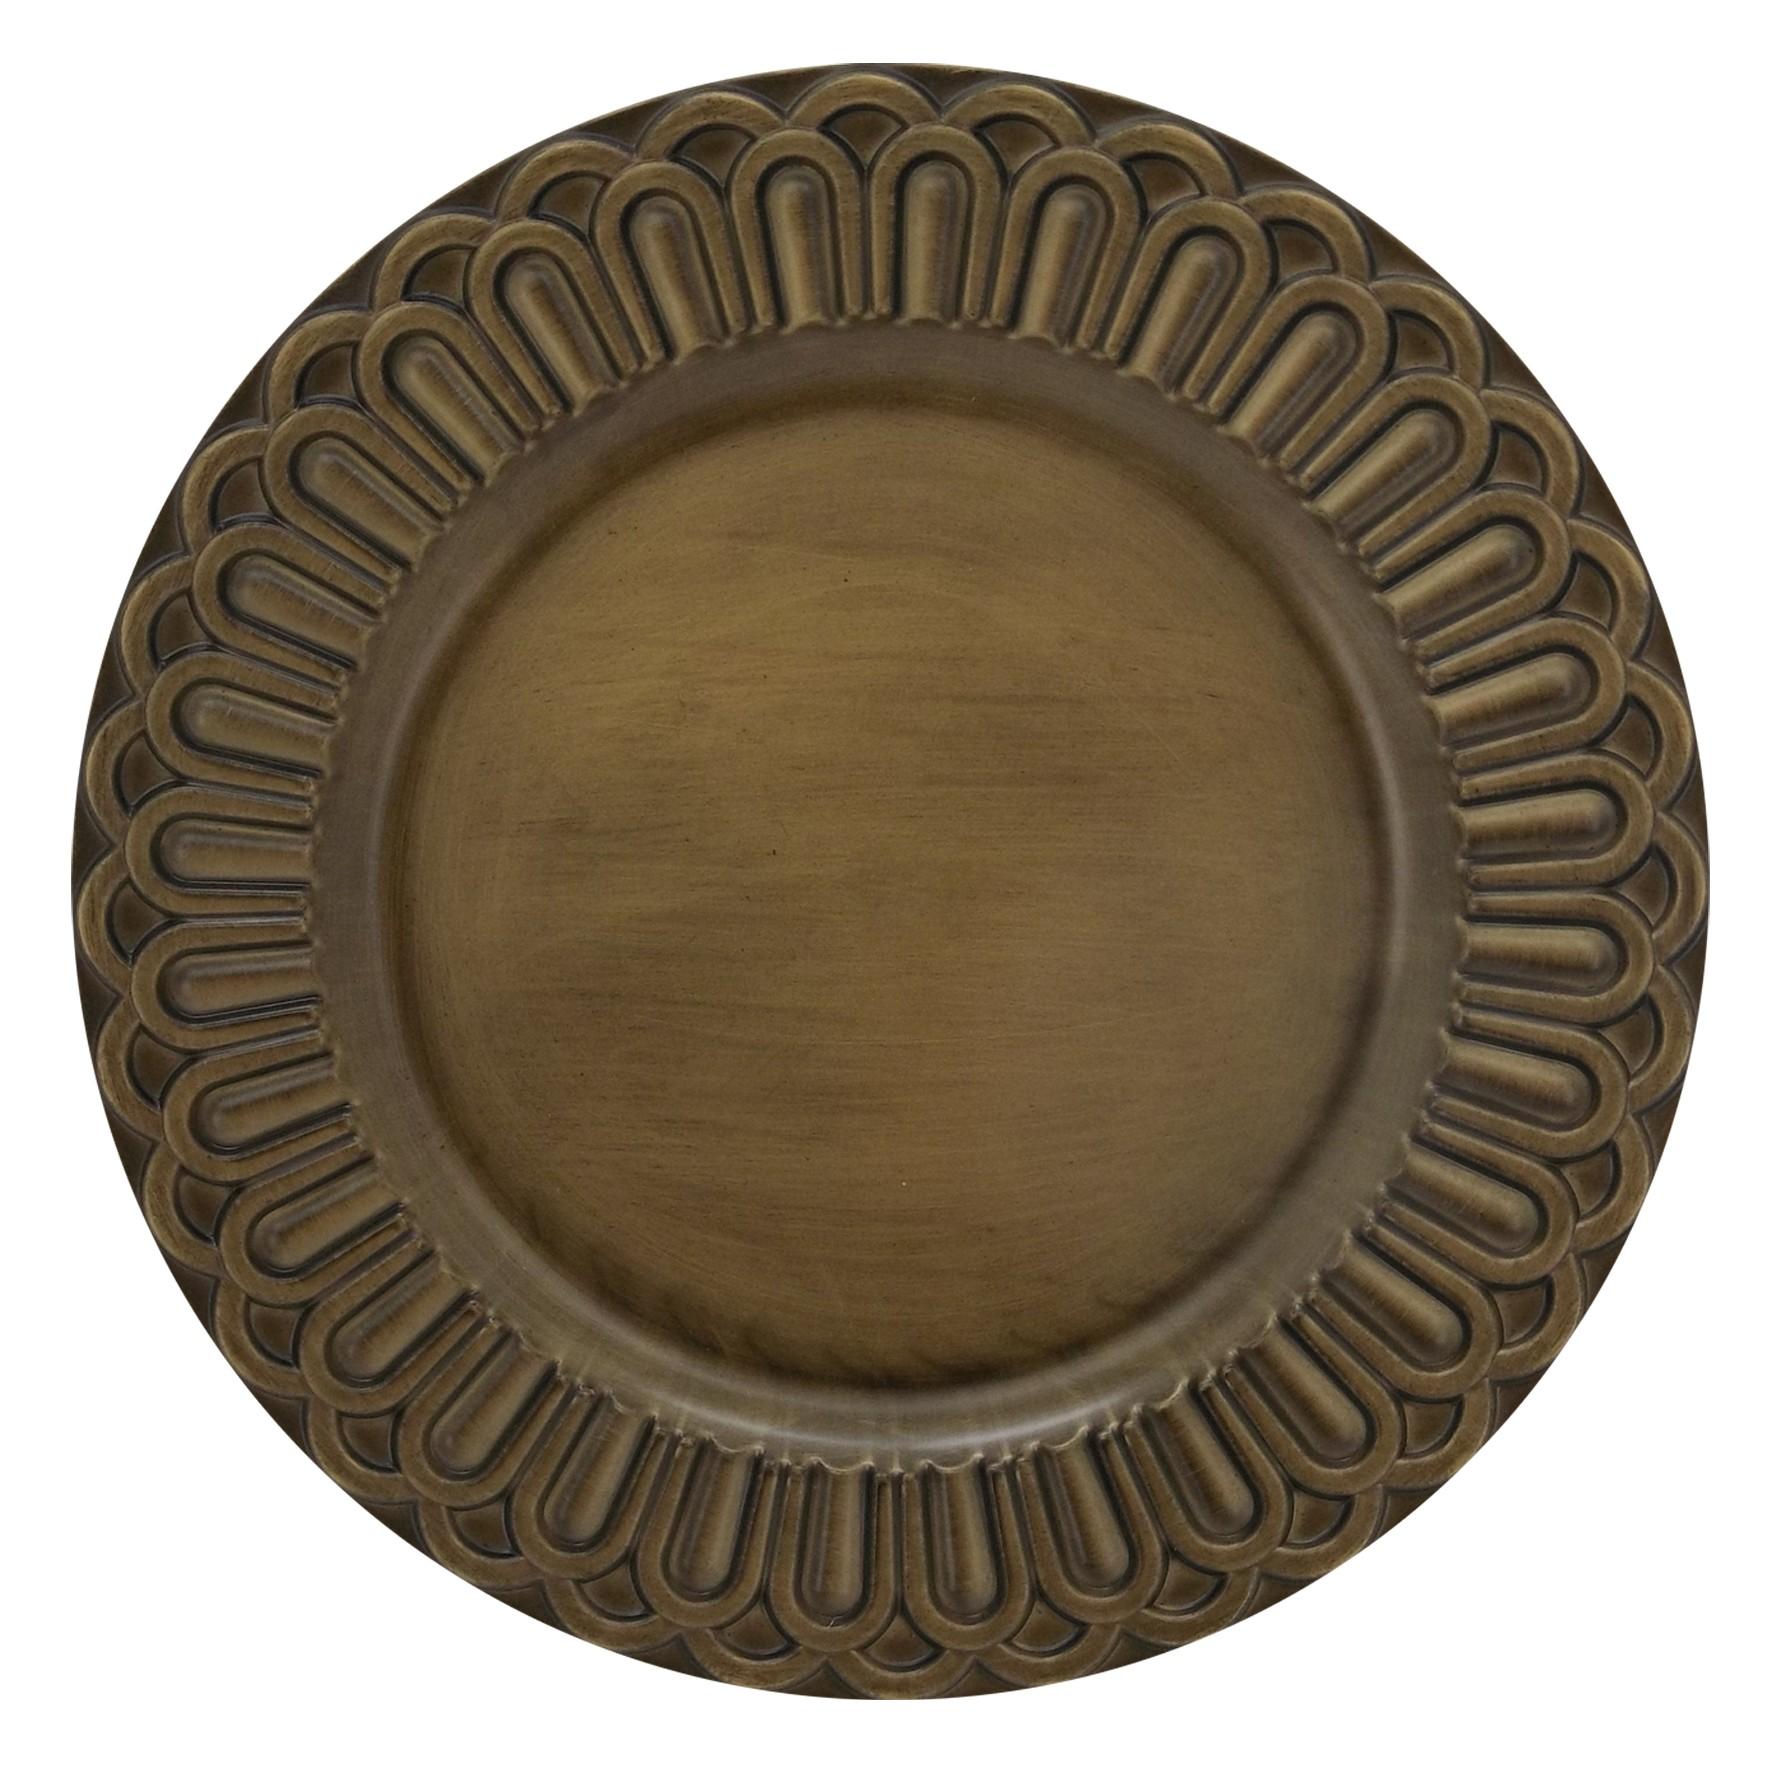 Sousplat Redondo Plastico 33cm Dourado Arcos - Mimo Style